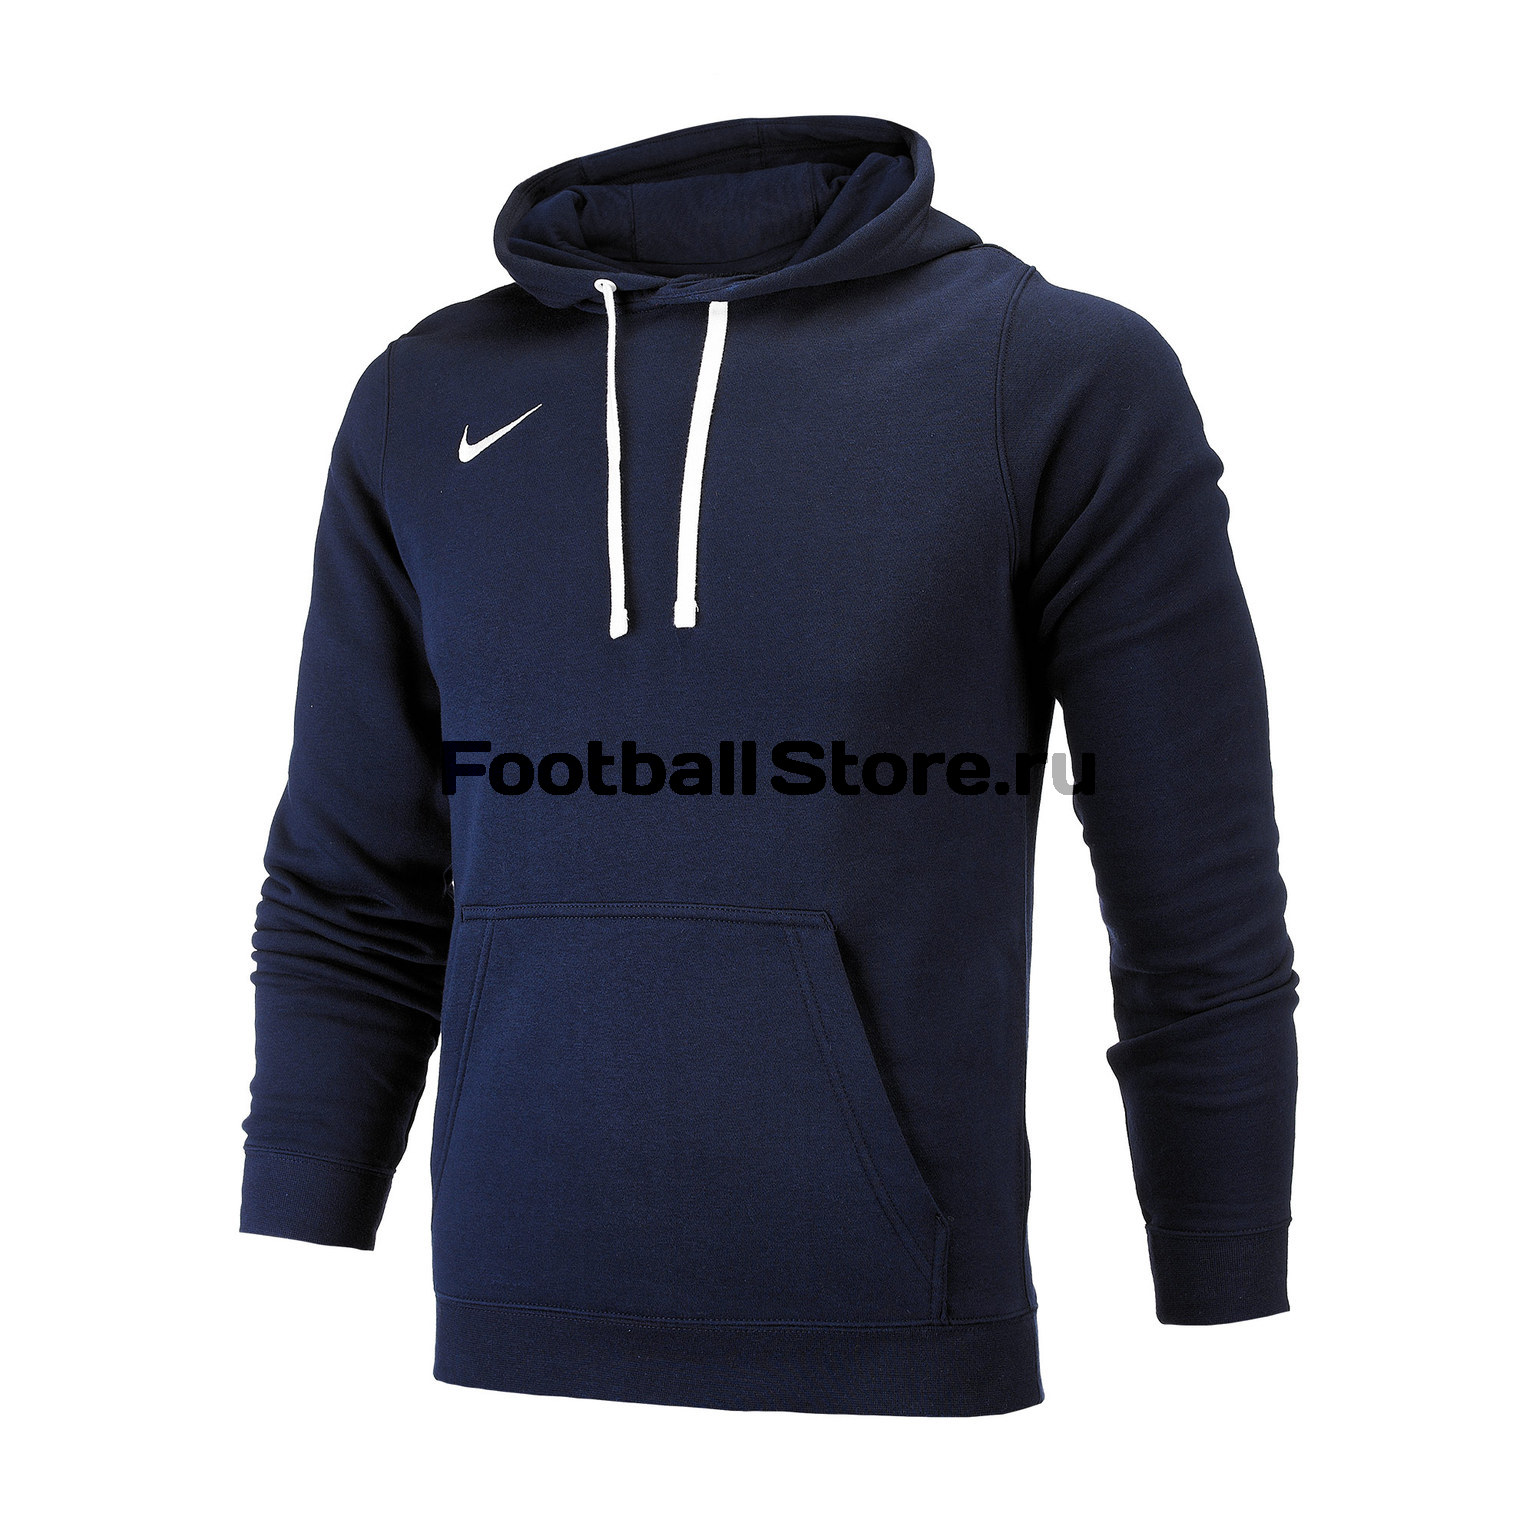 Толстовка Nike Hoodie Po Flc Club19 AR3239-451 толстовка подростковая nike hoodie fz flc club19 aj1458 010